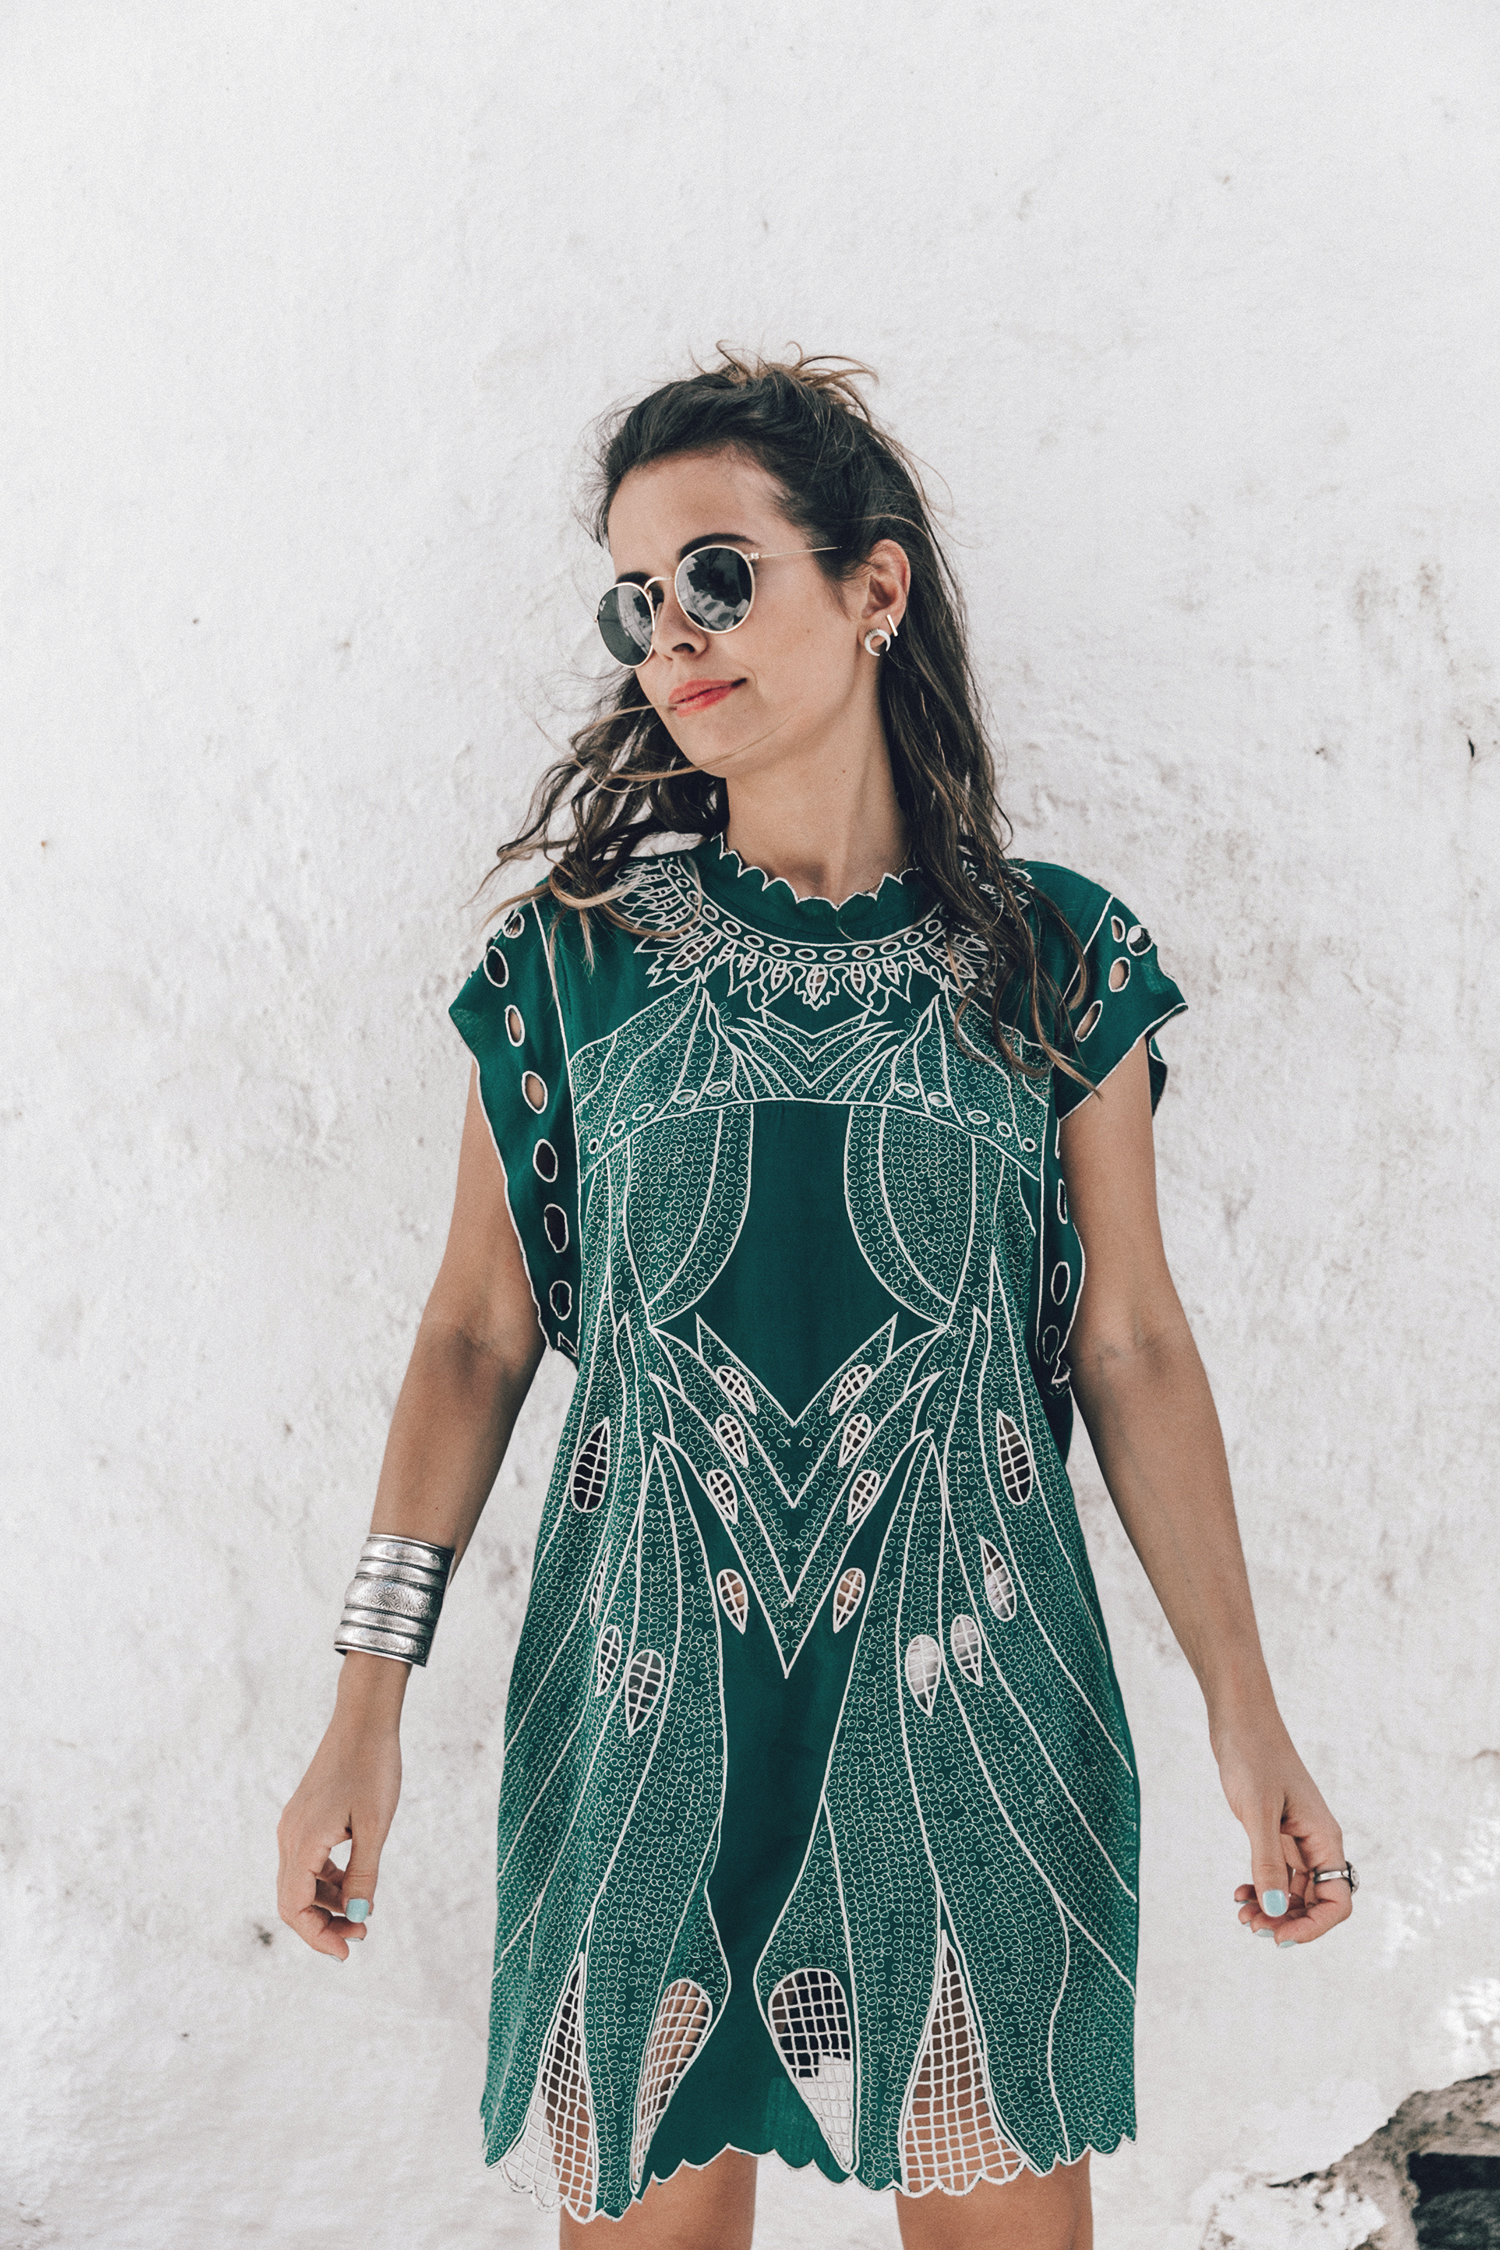 Tularosa_Dress-Soludos_Escapes-Soludos_Espadrilles-Sezane_Bag-Leather_Crossbody_Bag-Boho_Outfit-Look-Ray_Ban-Street_Style-Mykonos-Greece-Collage_Vintage-94-Recuperado